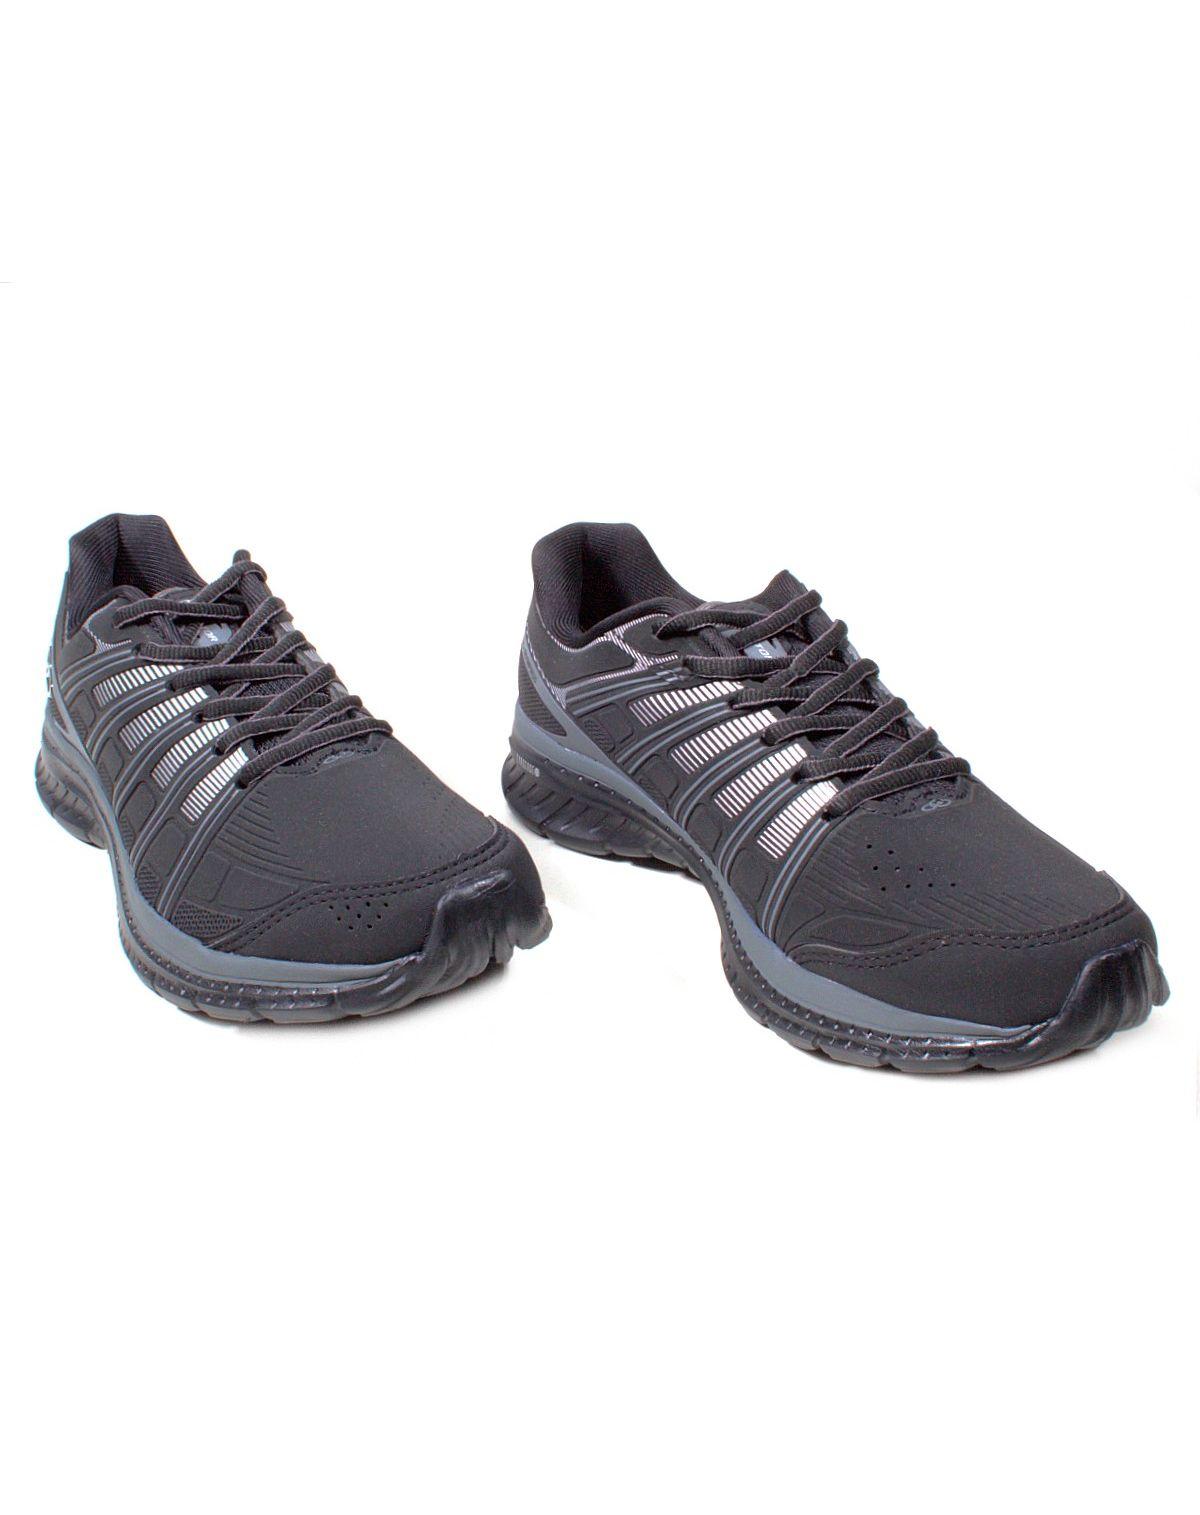 2050005463797-Tenis-Masculino-Olympikus-Vetor-PRETO-CHUMBO-38-1